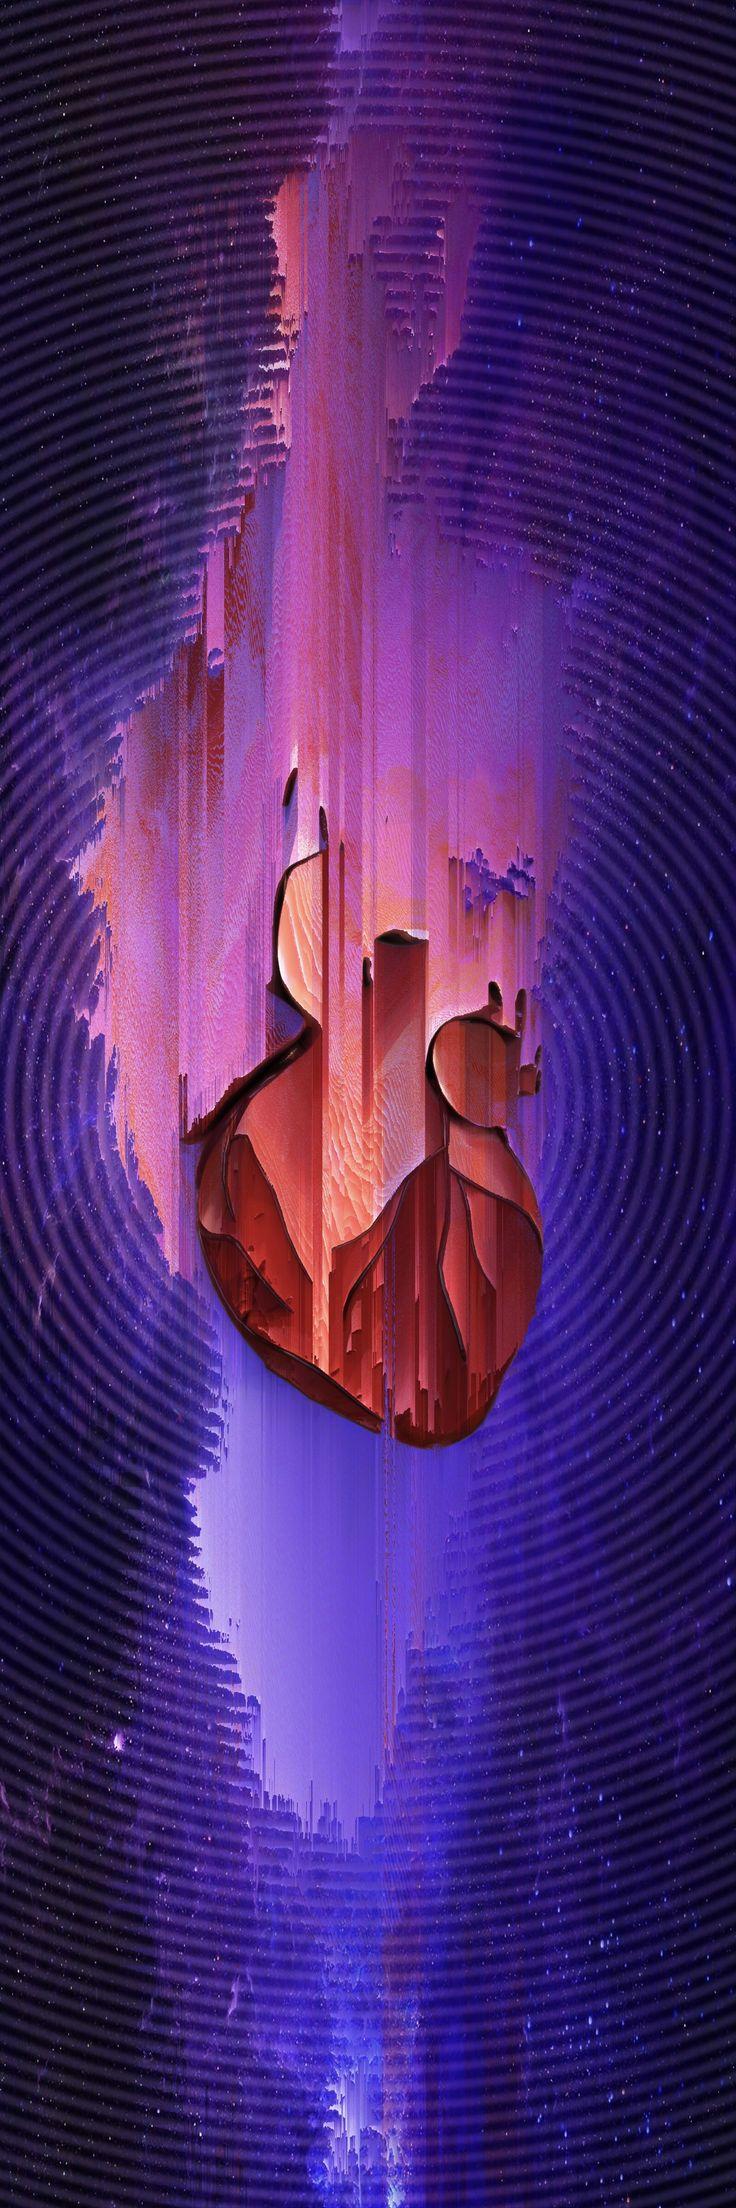 My heart bearing  #design #digital #edit #photoshop #digitalart #vaporwave #glitch #pixelsorting  #nebula